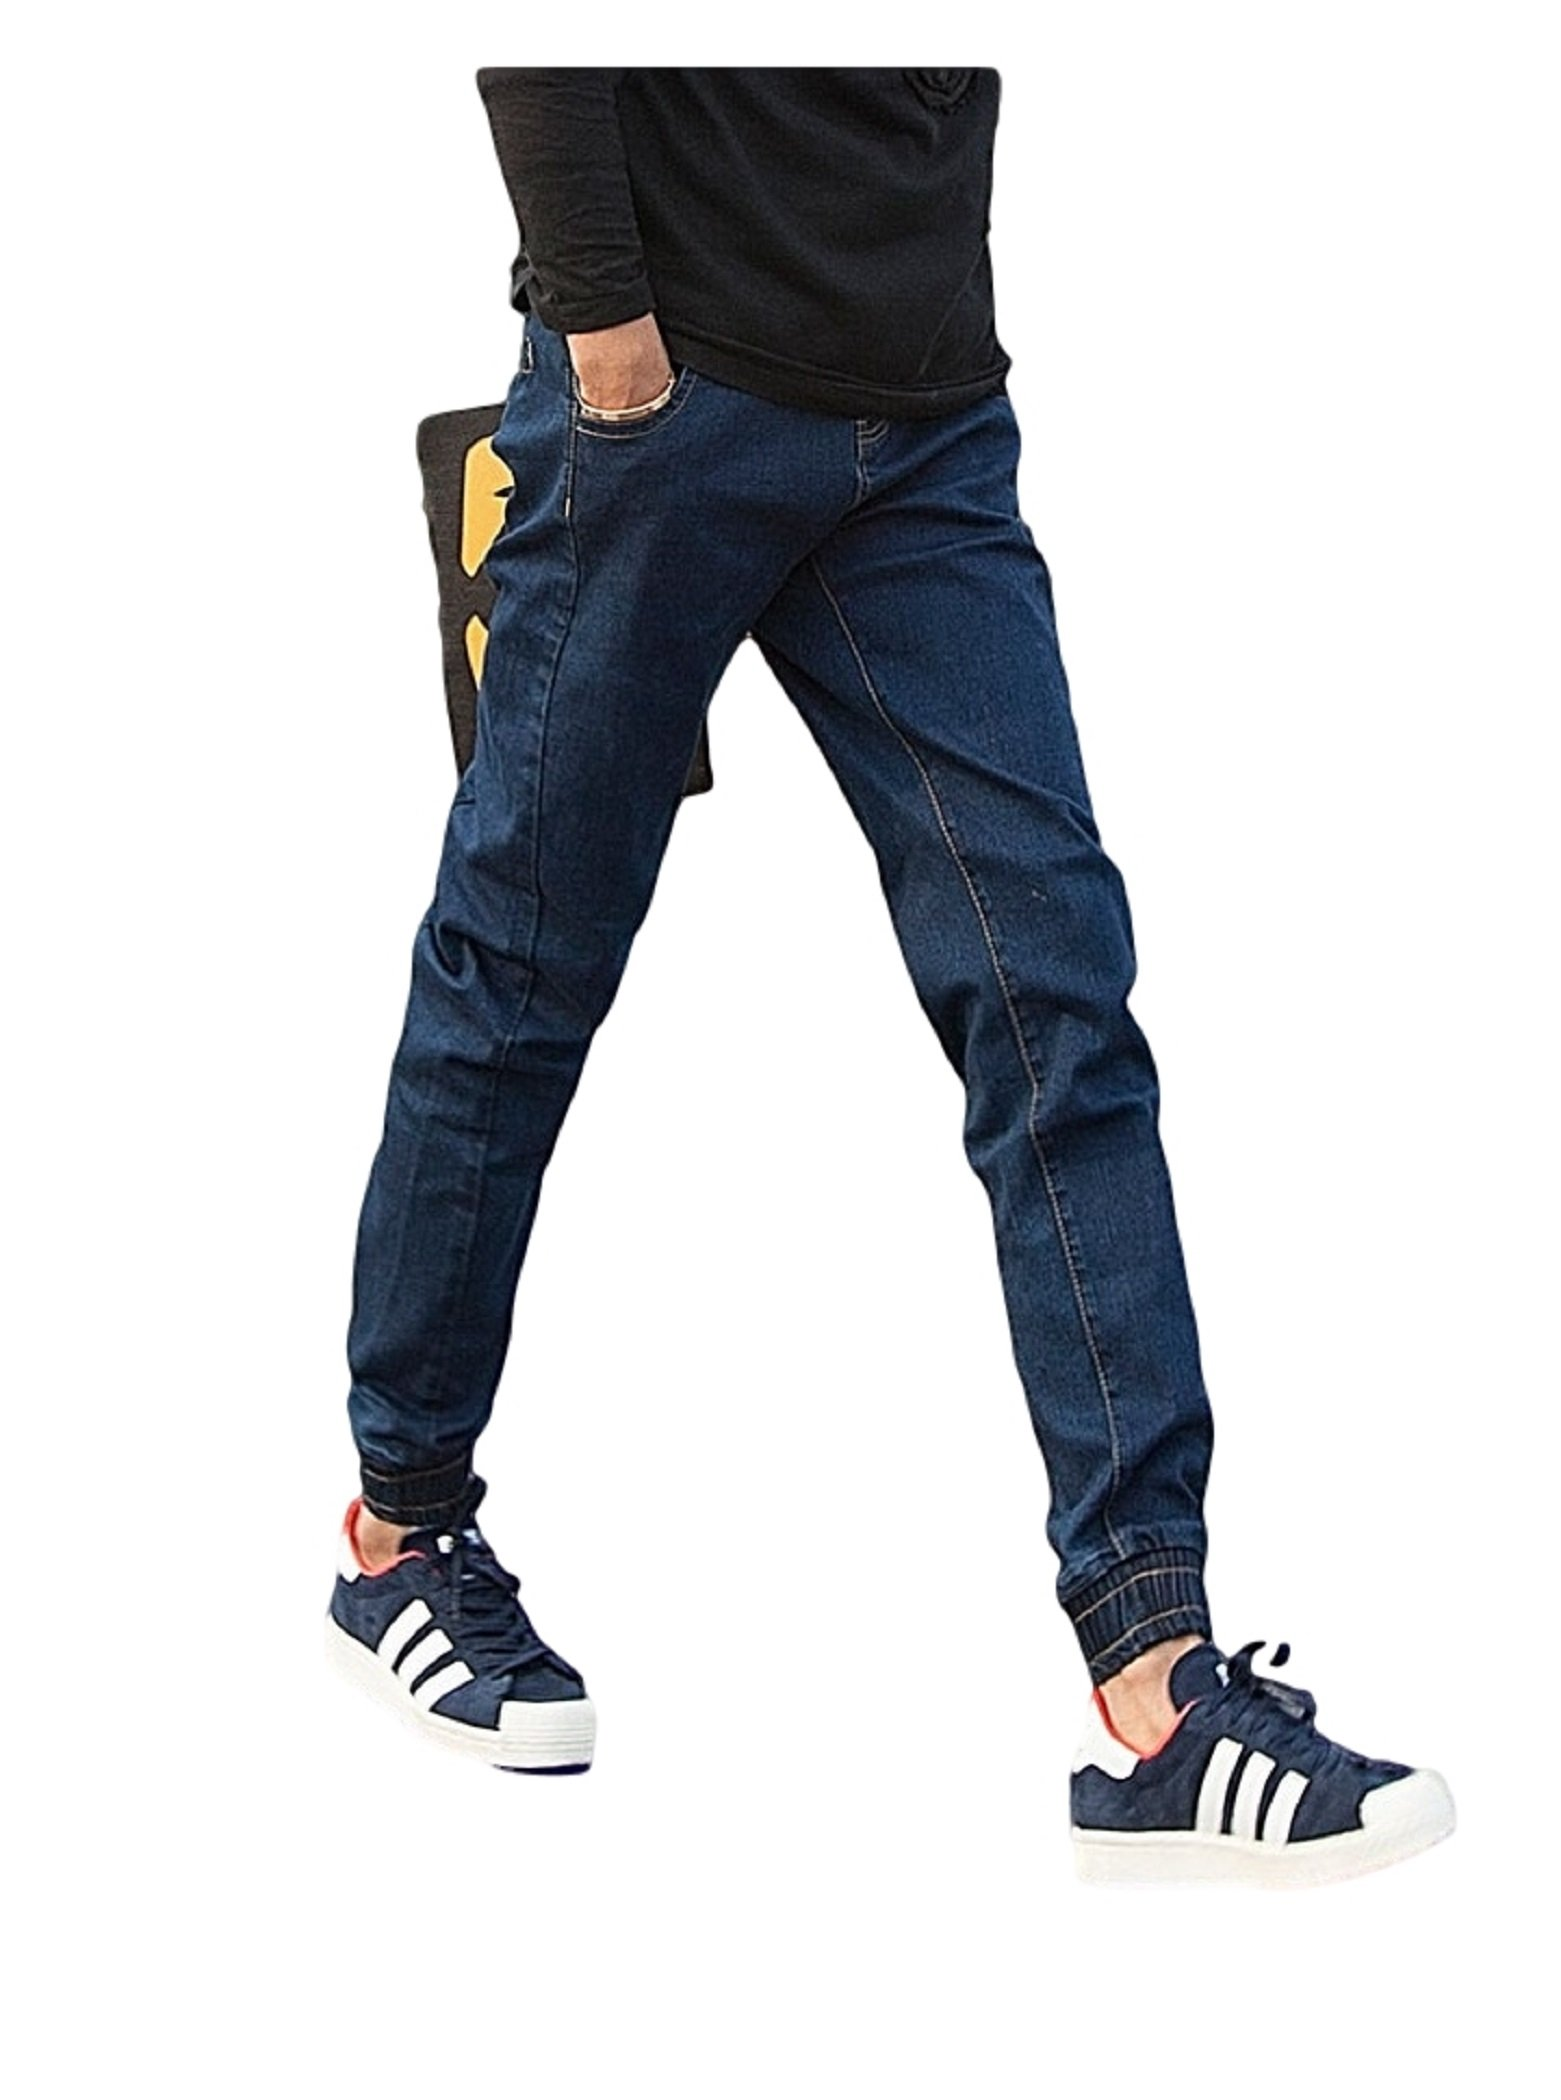 JOKER メンズ パンツ ジーンズ テーパード デニム ストリート スリム カジュアル 通学 通勤 デート 学校 トラベル 旅行 仕事 デート ショッピング  オリジナルブレスレット付 SB02328